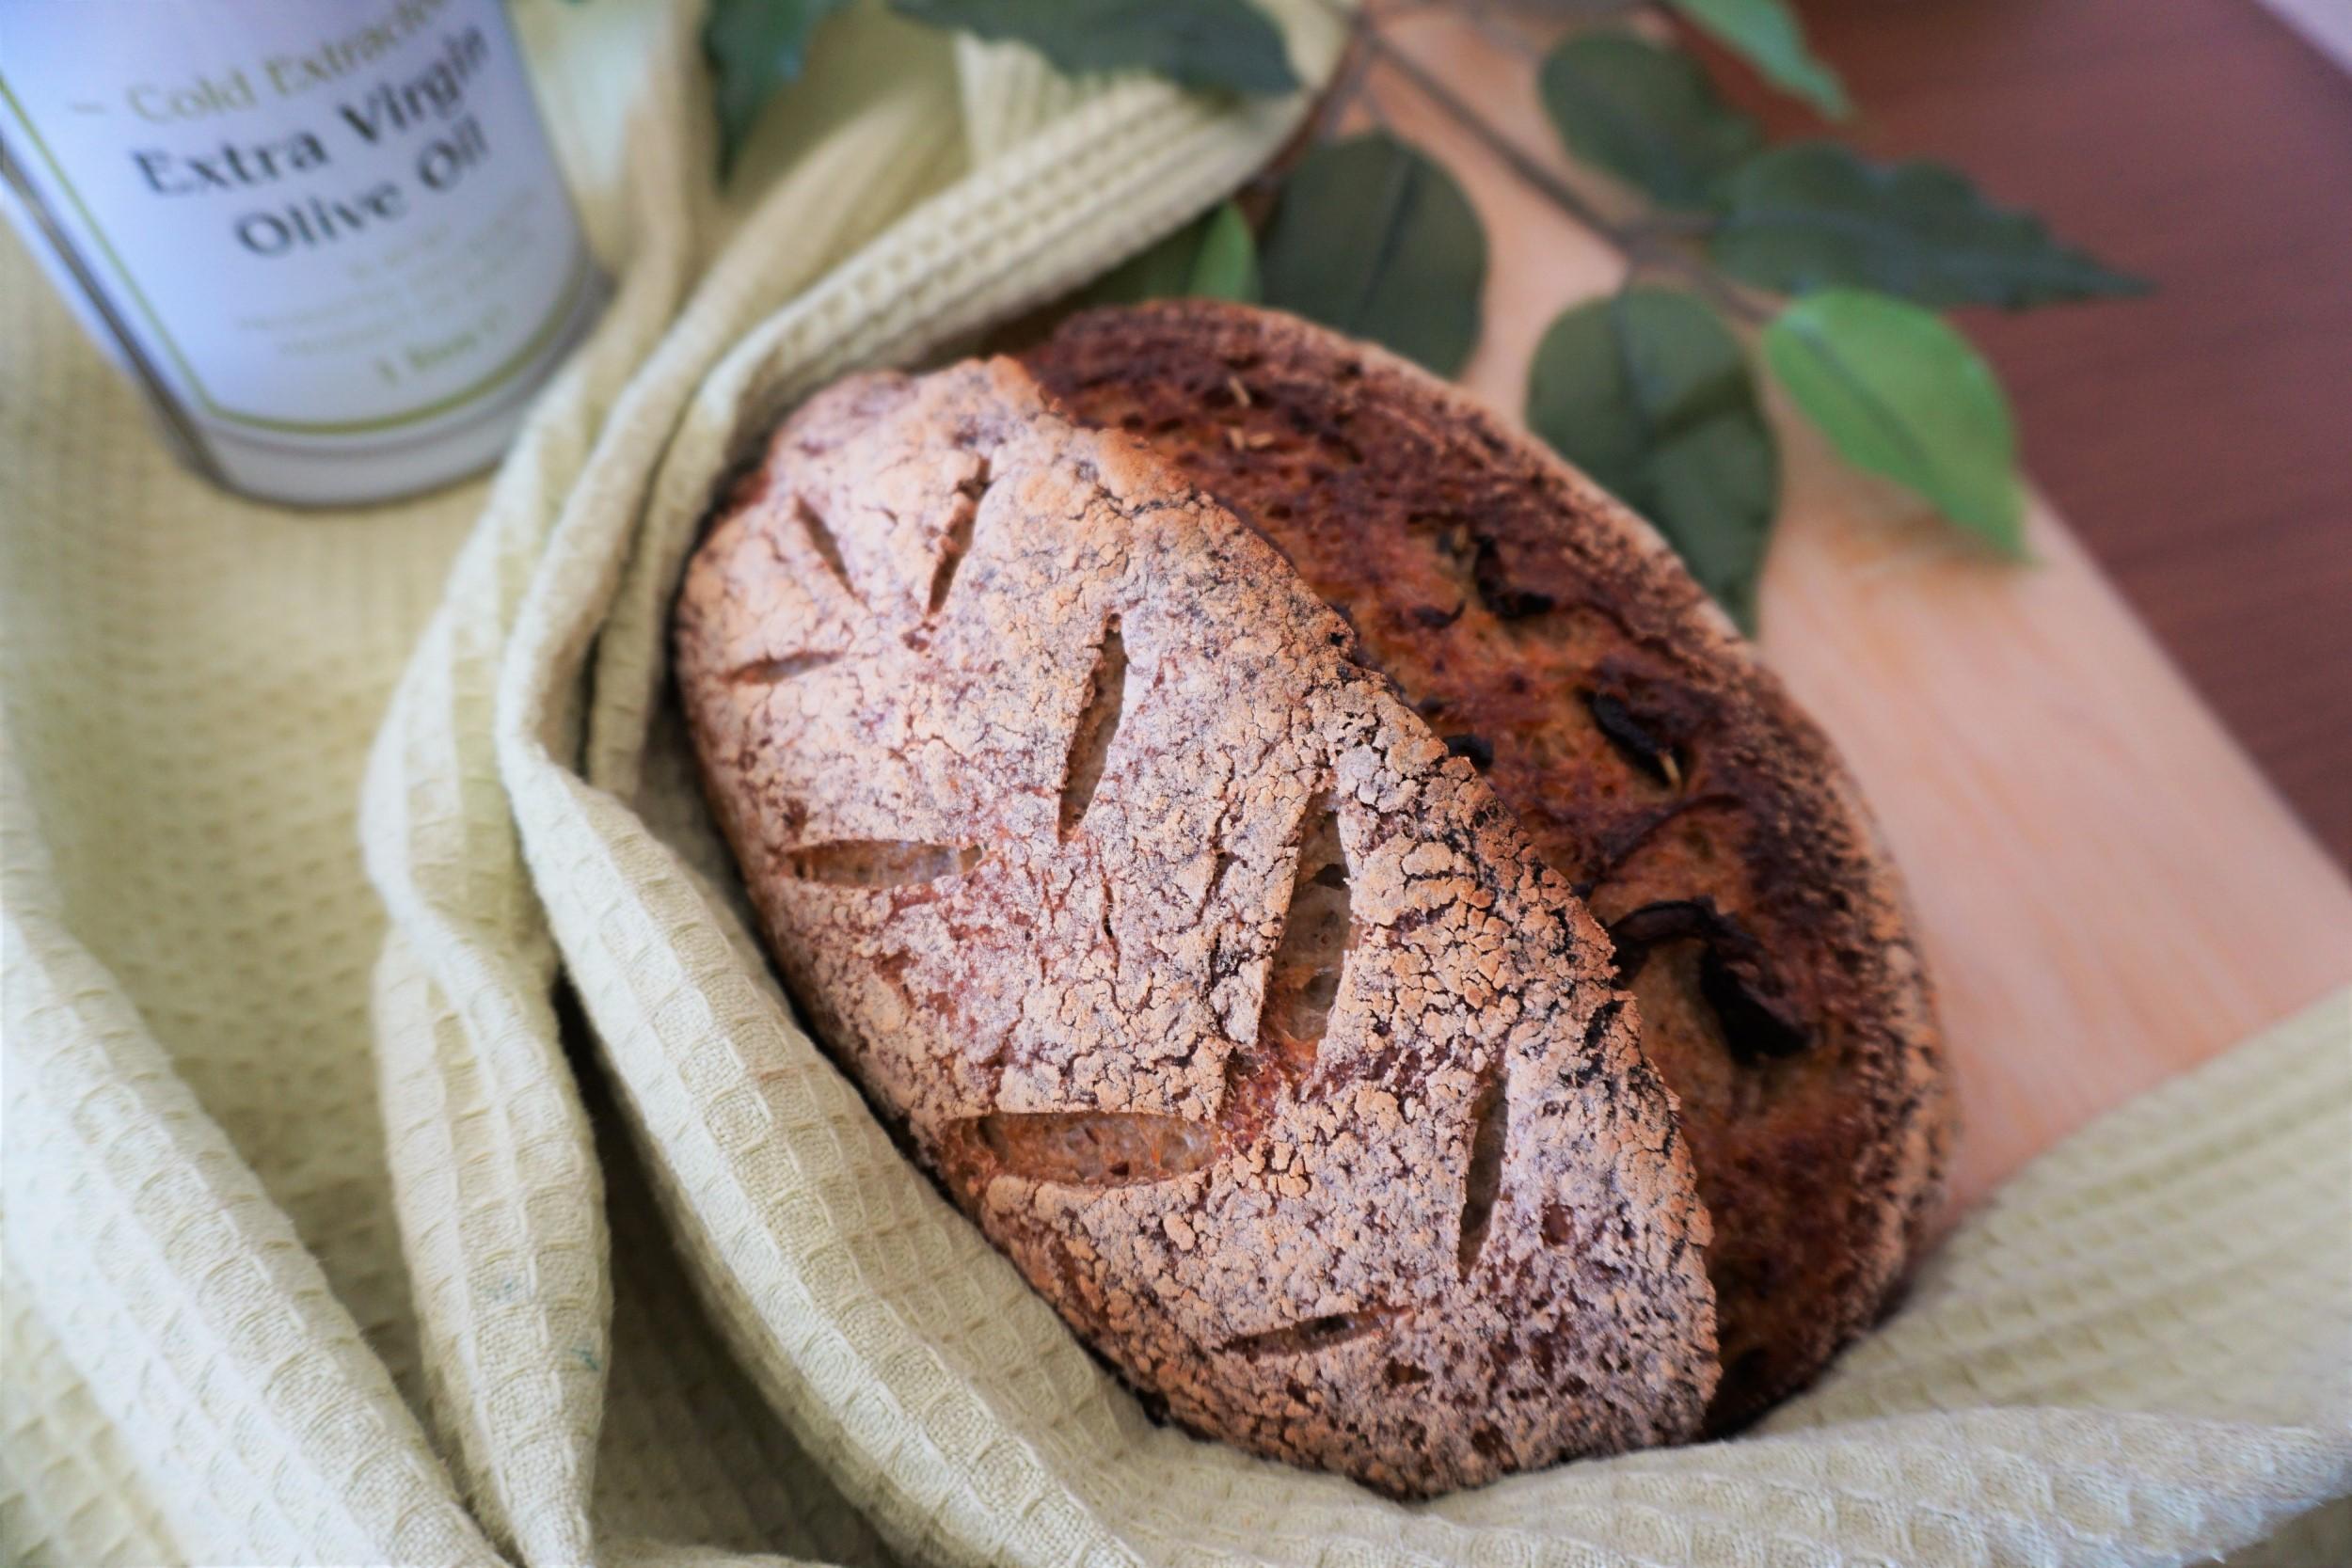 Gluten-free sourdough starter: tweaks and tips!